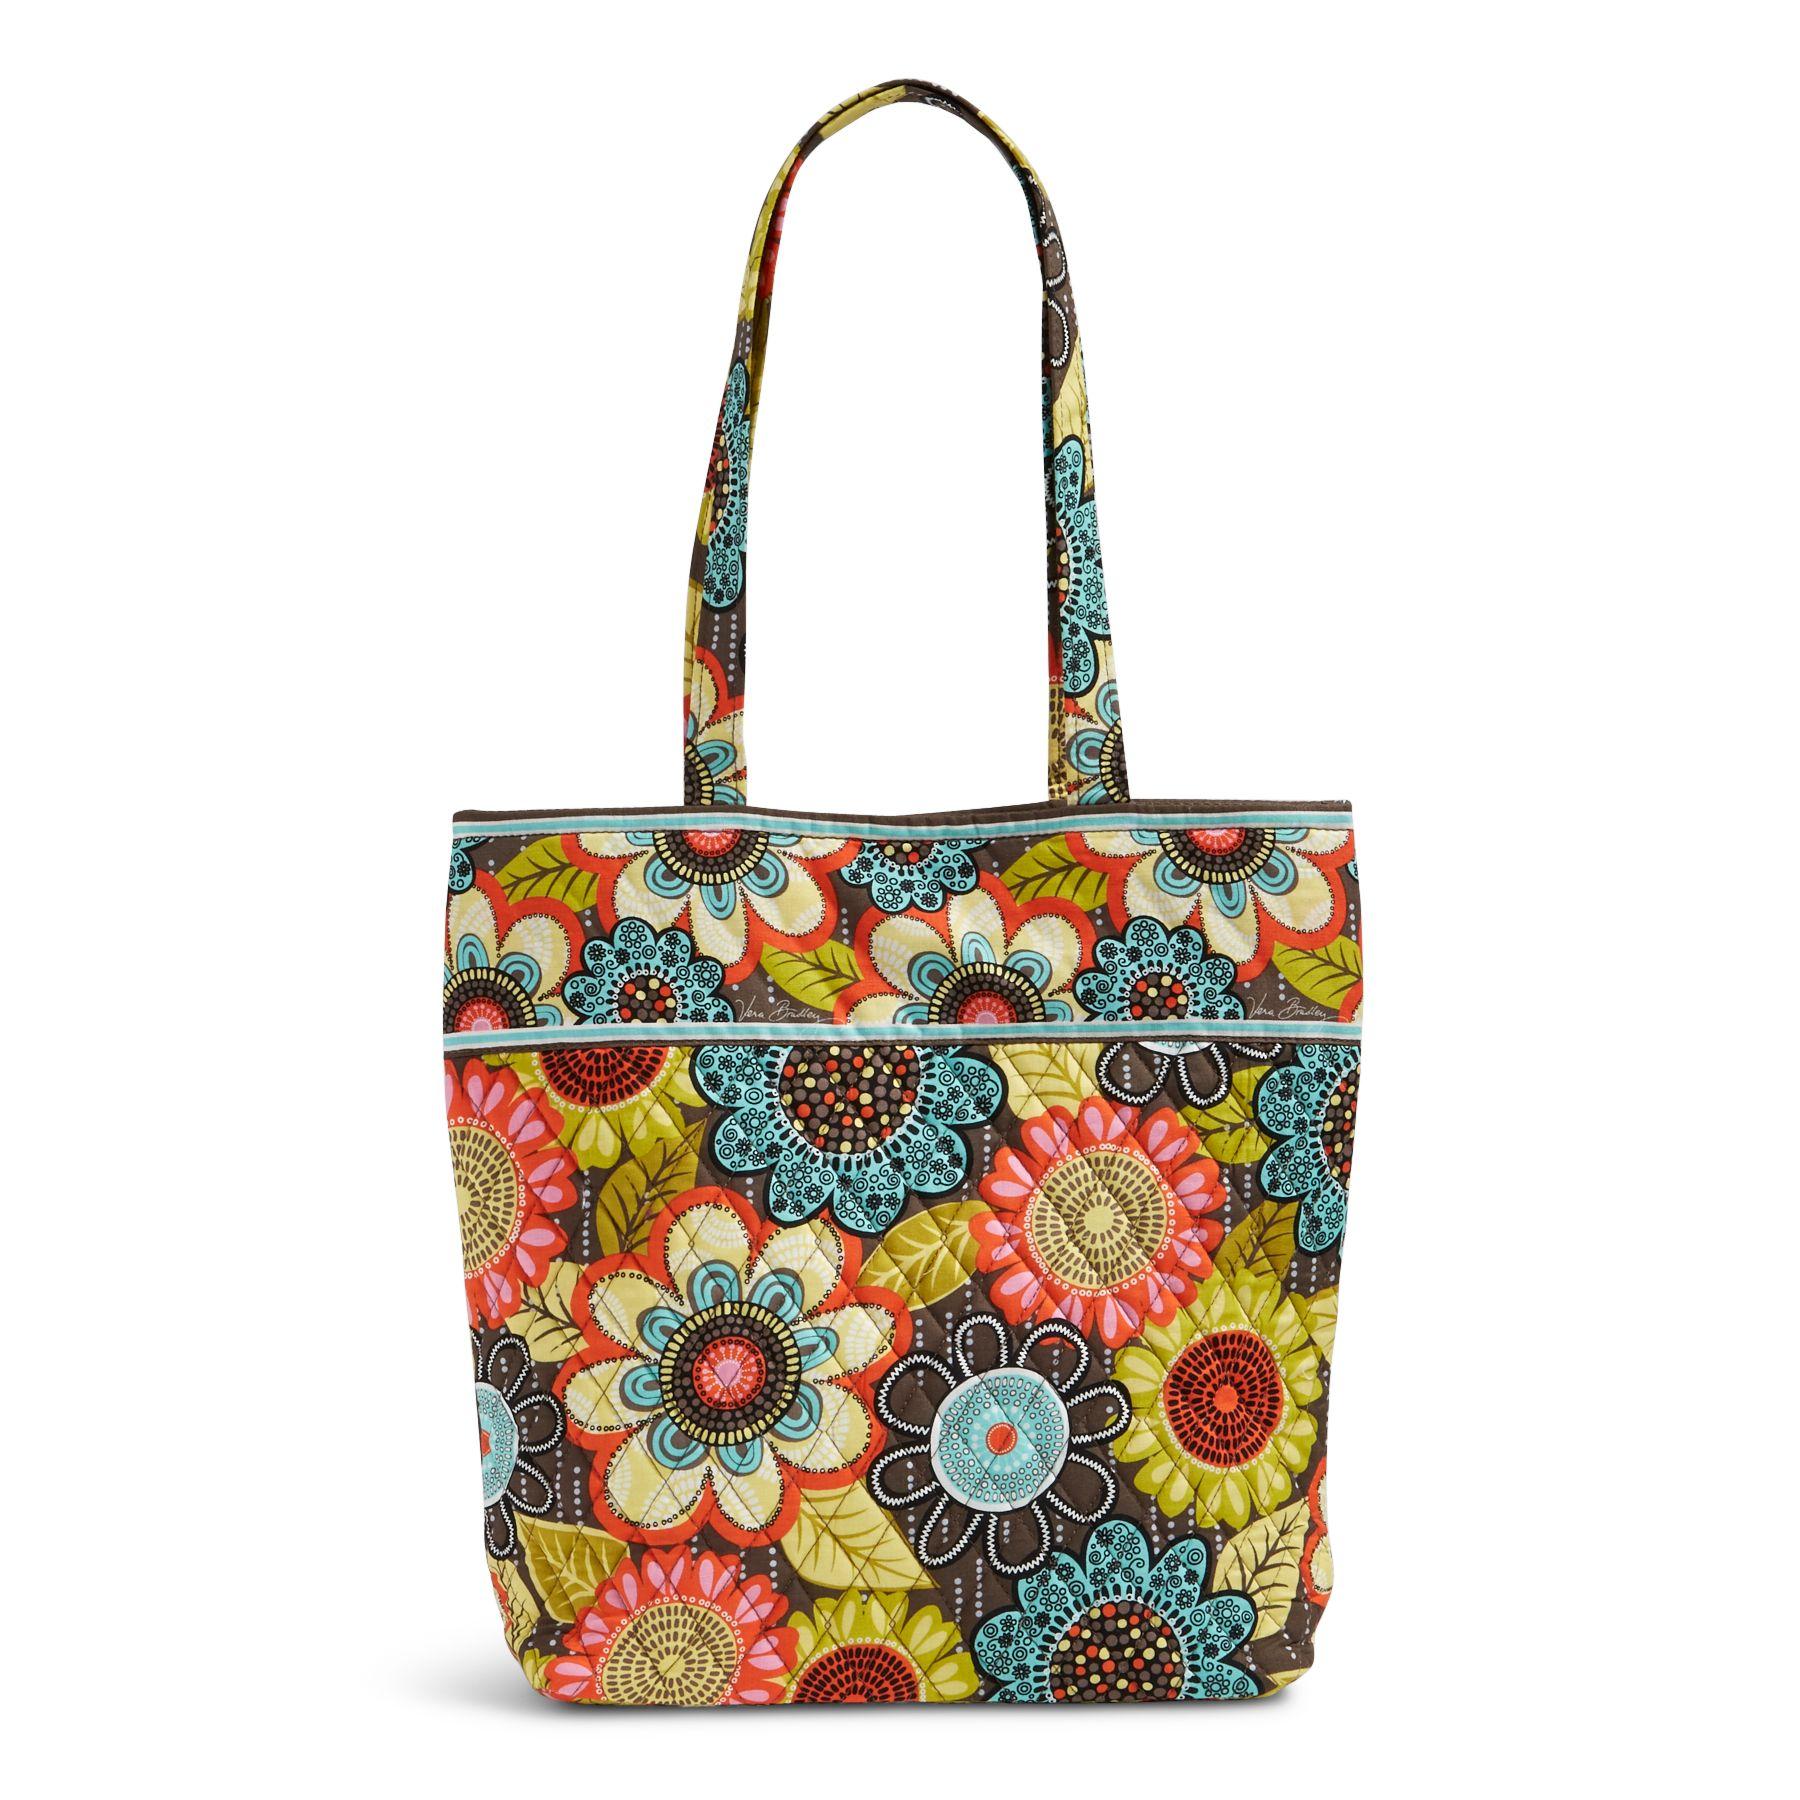 Vera Bradley Factory Exclusive Tote Bag (Multiple Colors)